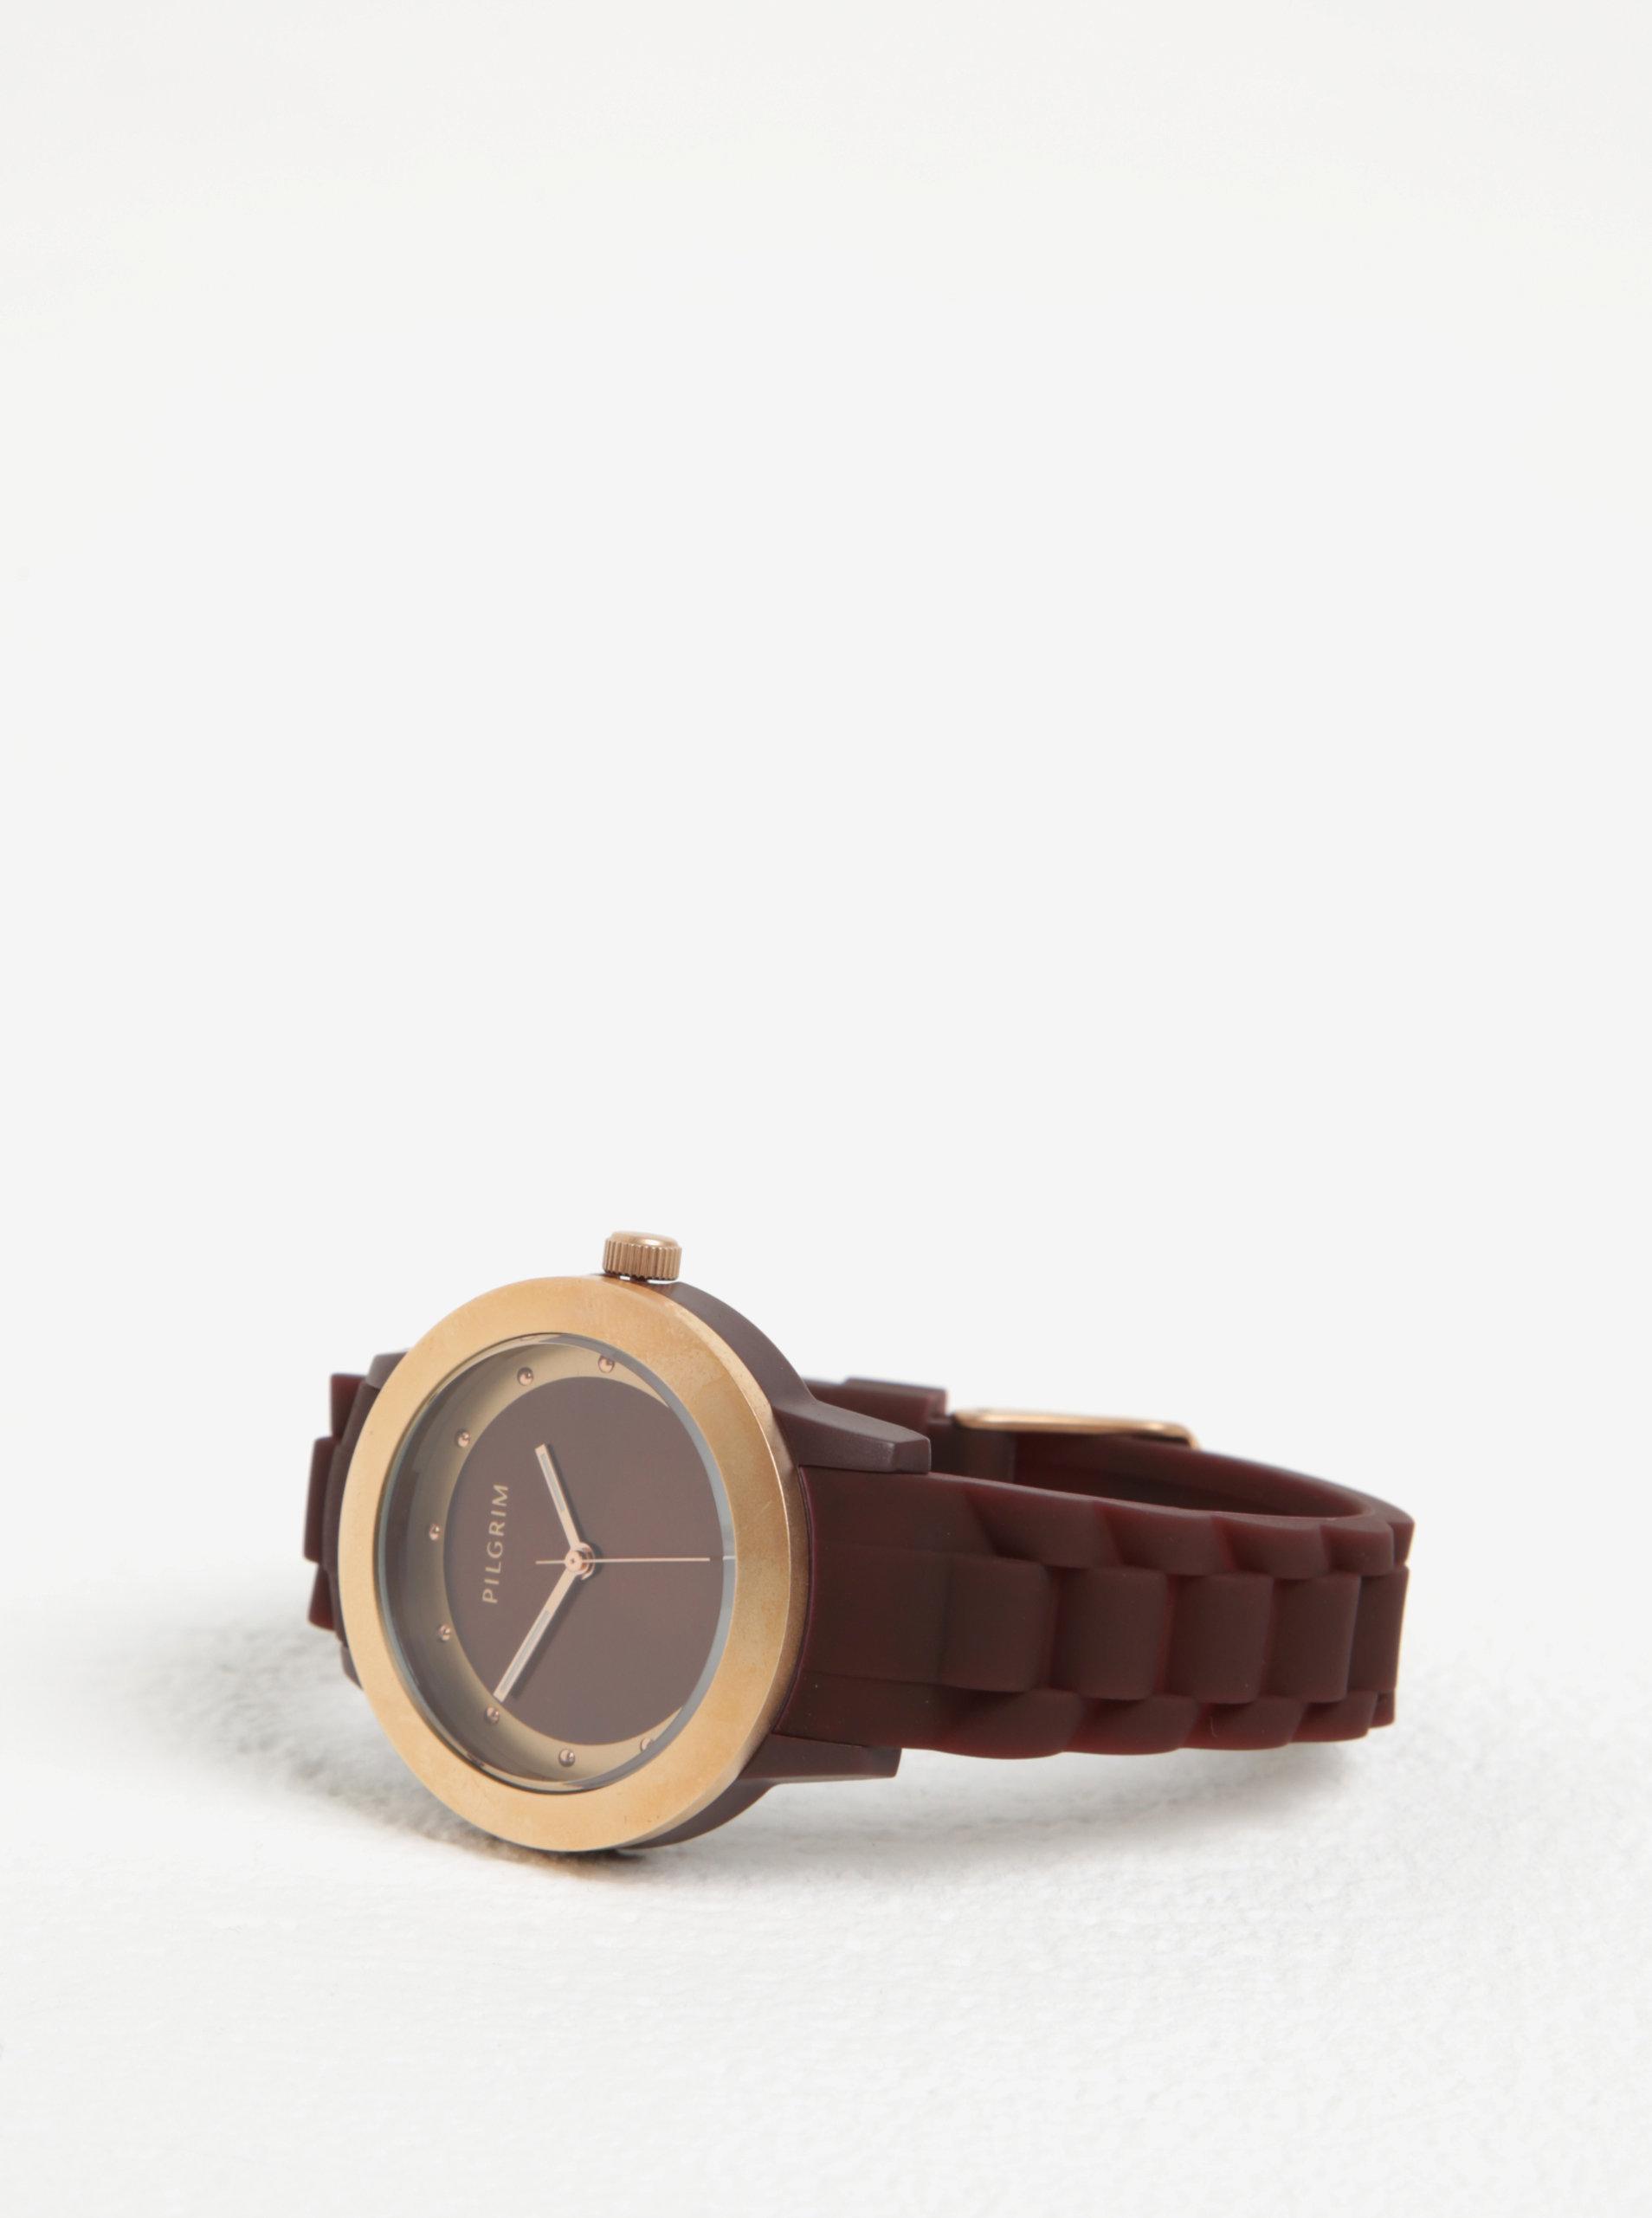 Dámské hodinky s vínovým silikonovým páskem Pilgrim Dámské hodinky s  vínovým silikonovým páskem Pilgrim ... f23d817e79